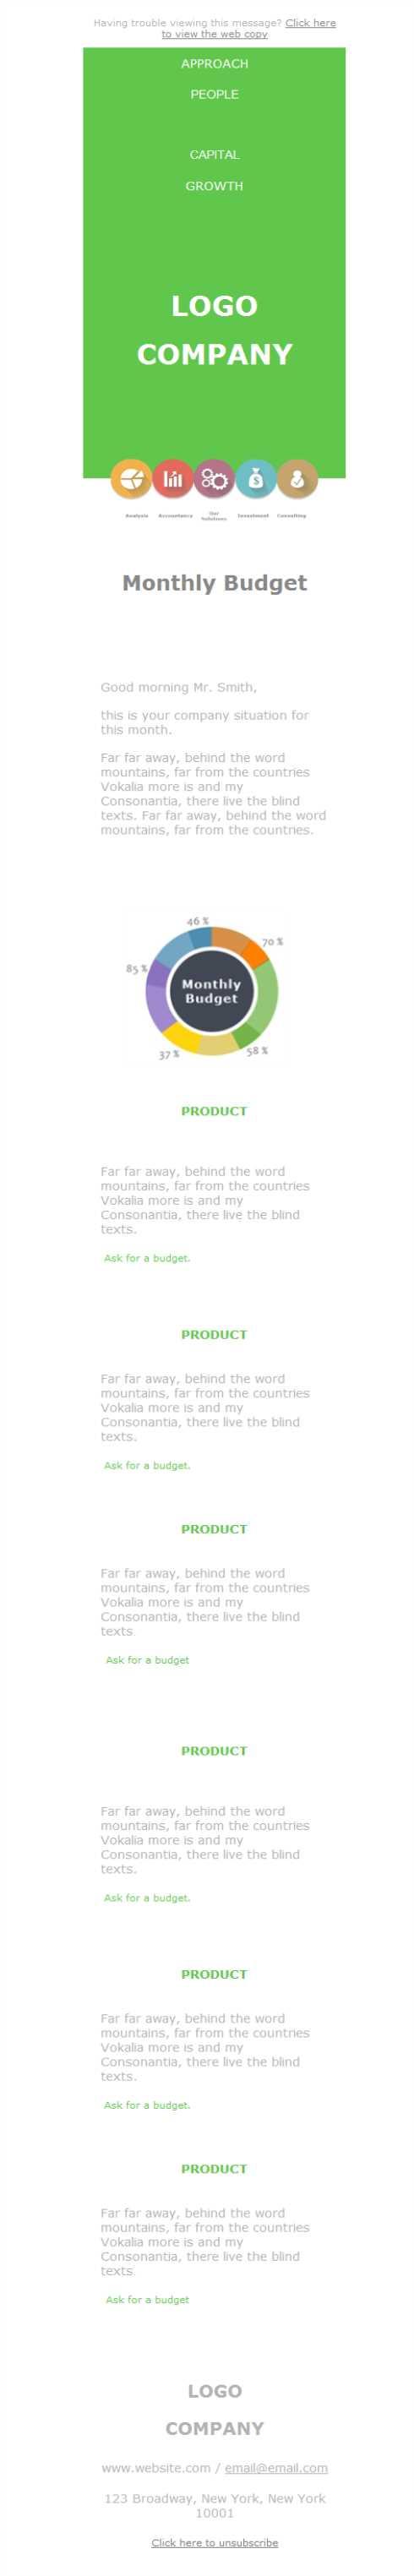 La plantilla newsletter perfecta para tu sector empresarial en ...